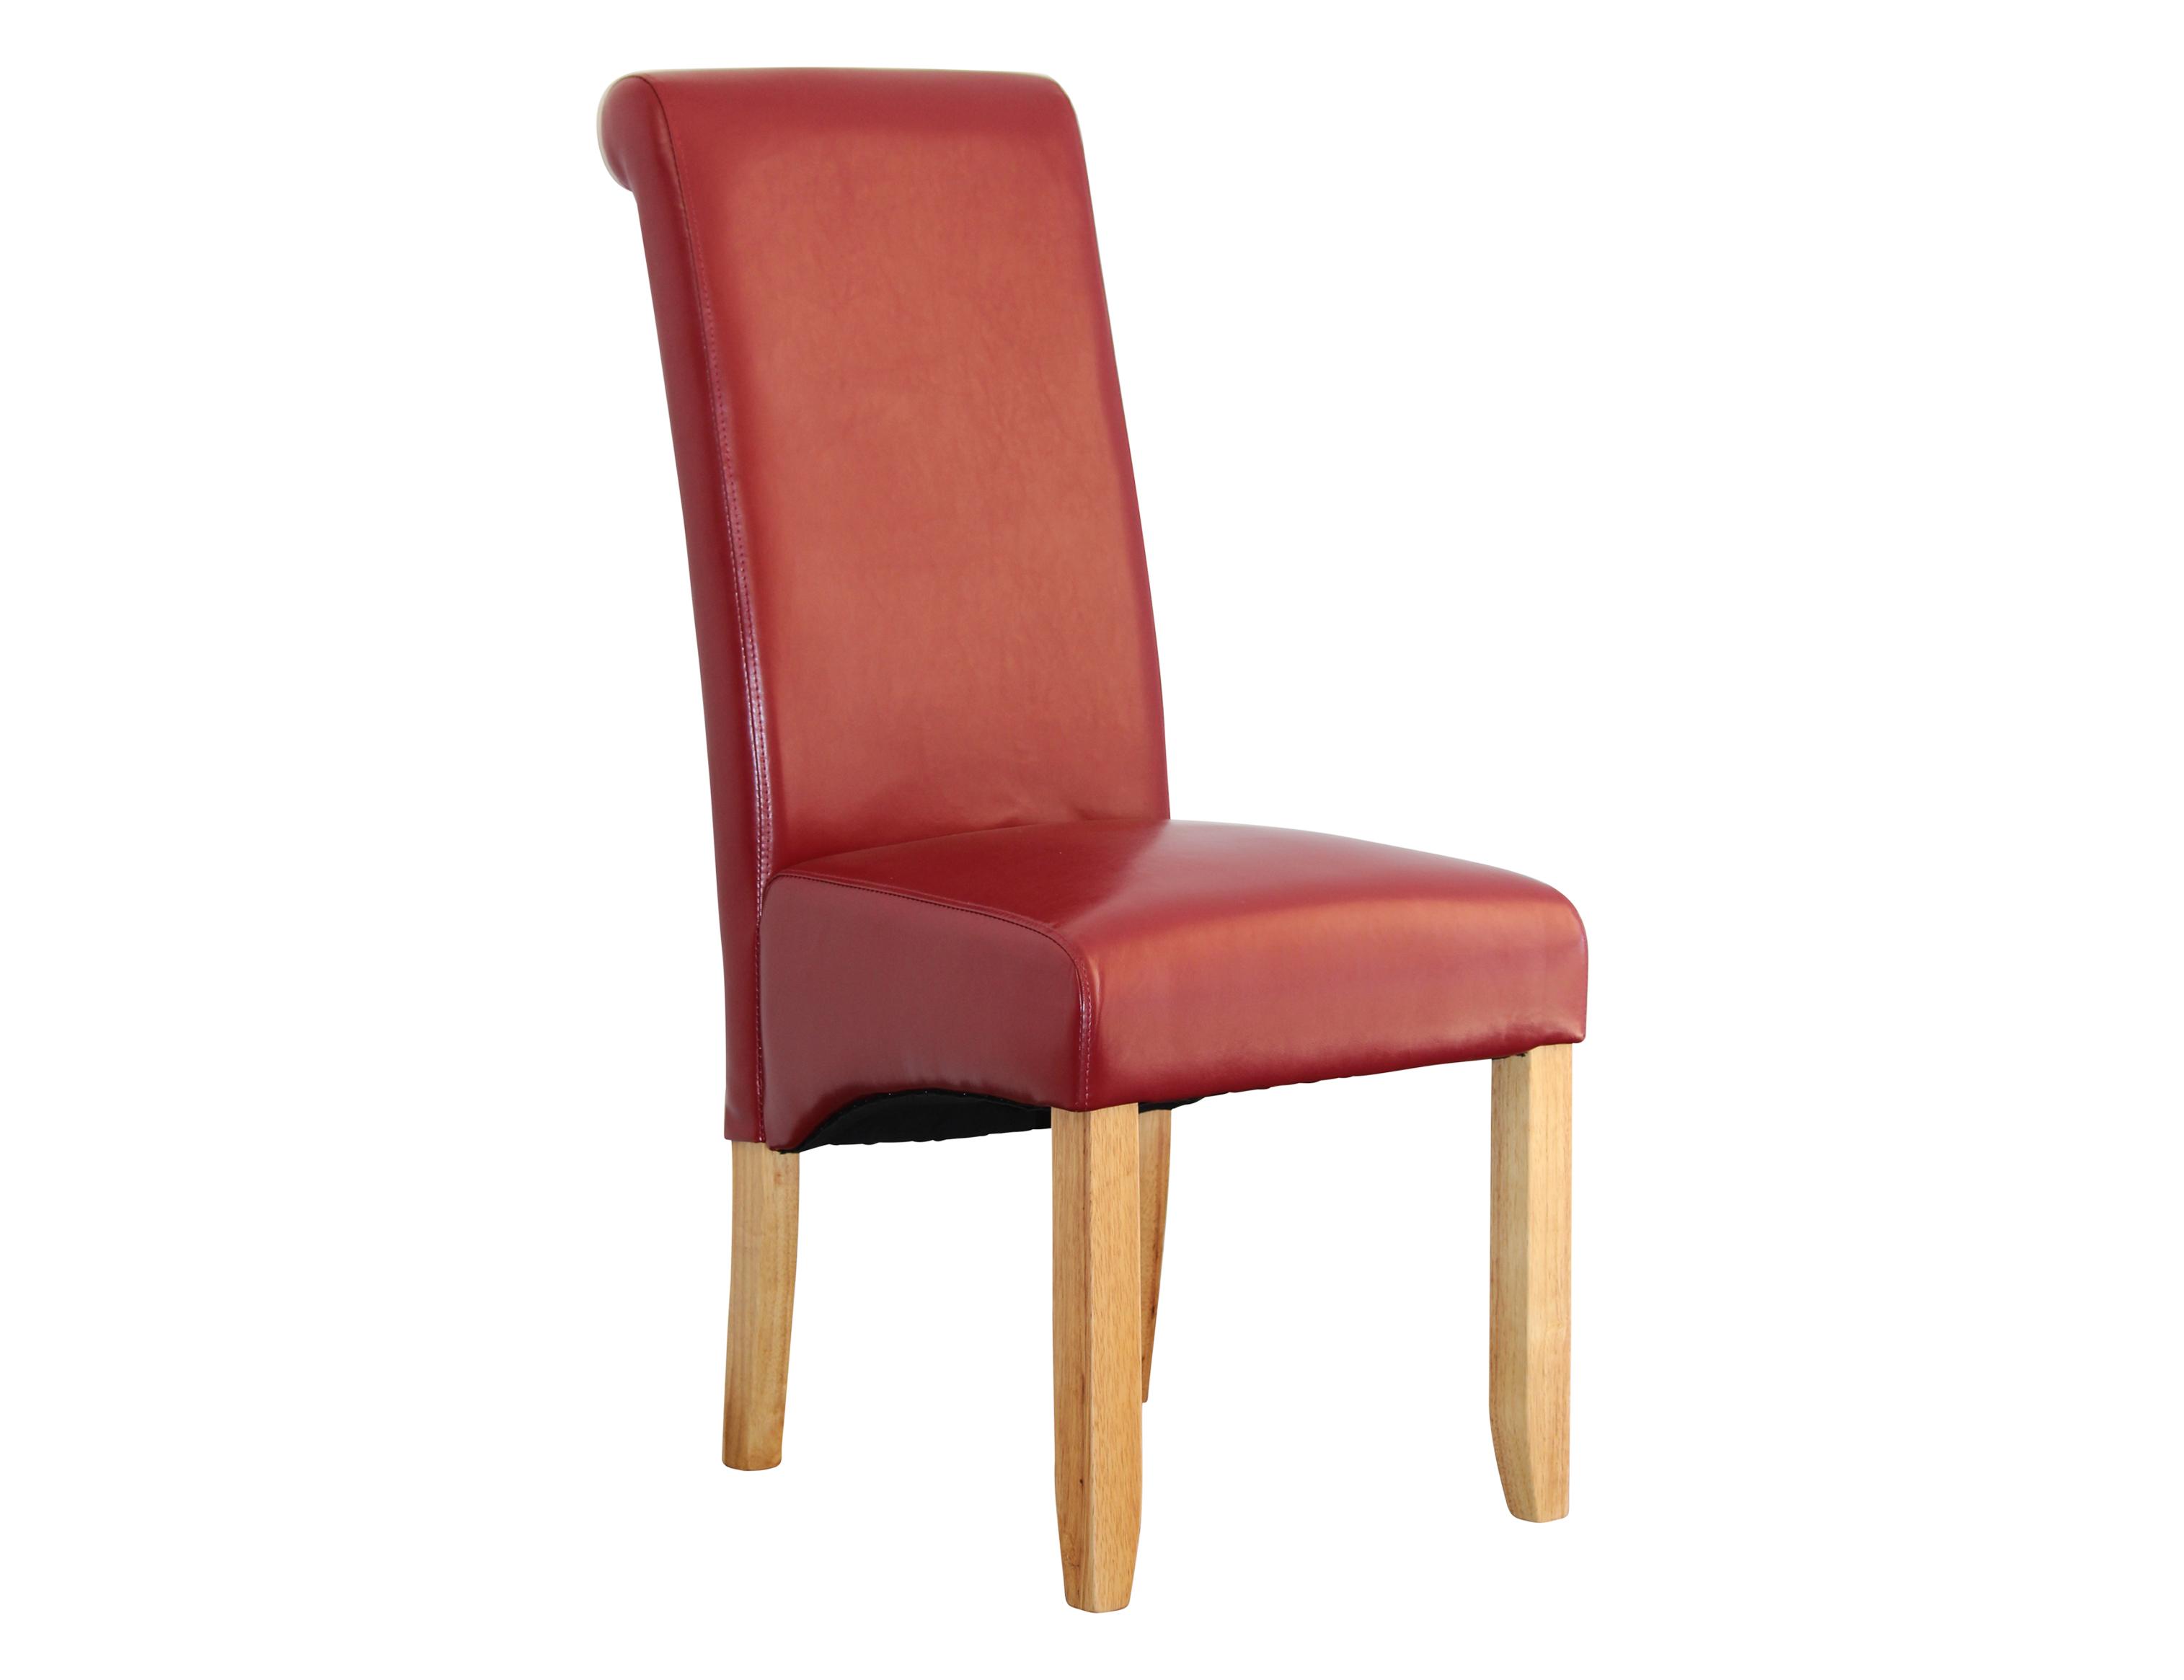 Avalon Dining Chair Blonde Red Berton Furniture